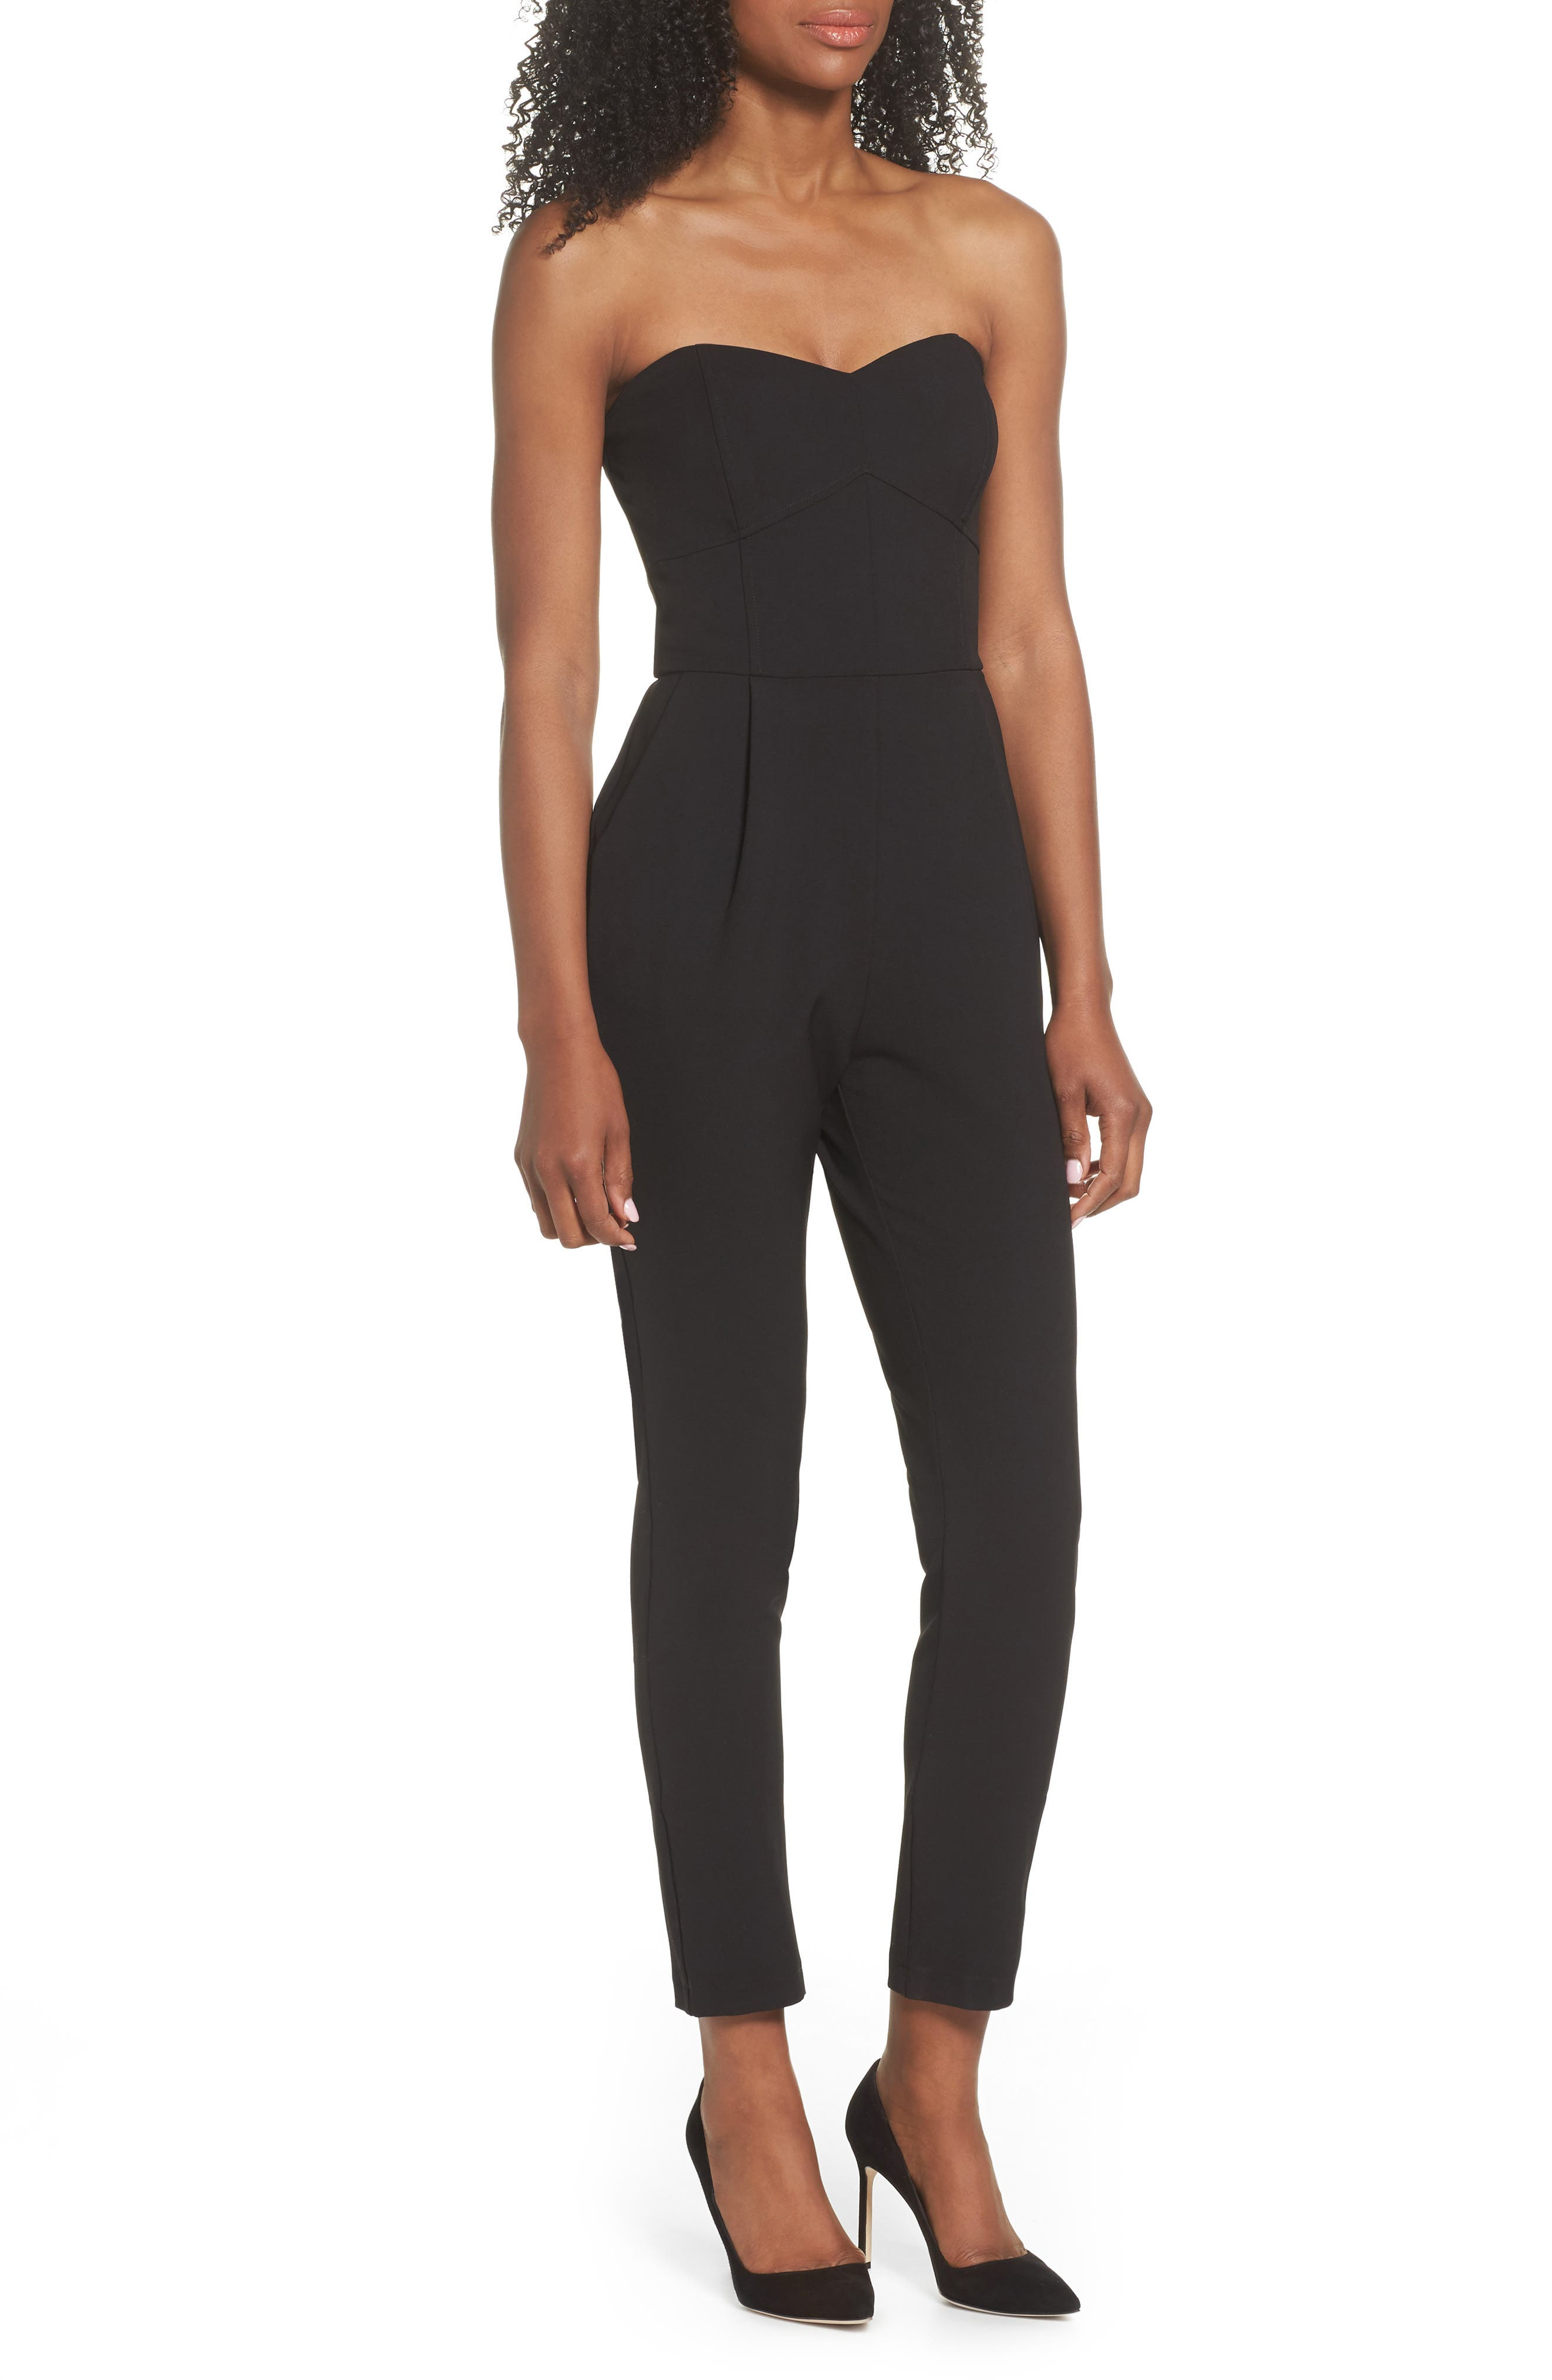 ADELYN RAE, Strapless Slim Leg Jumpsuit, Main thumbnail 1, color, 001